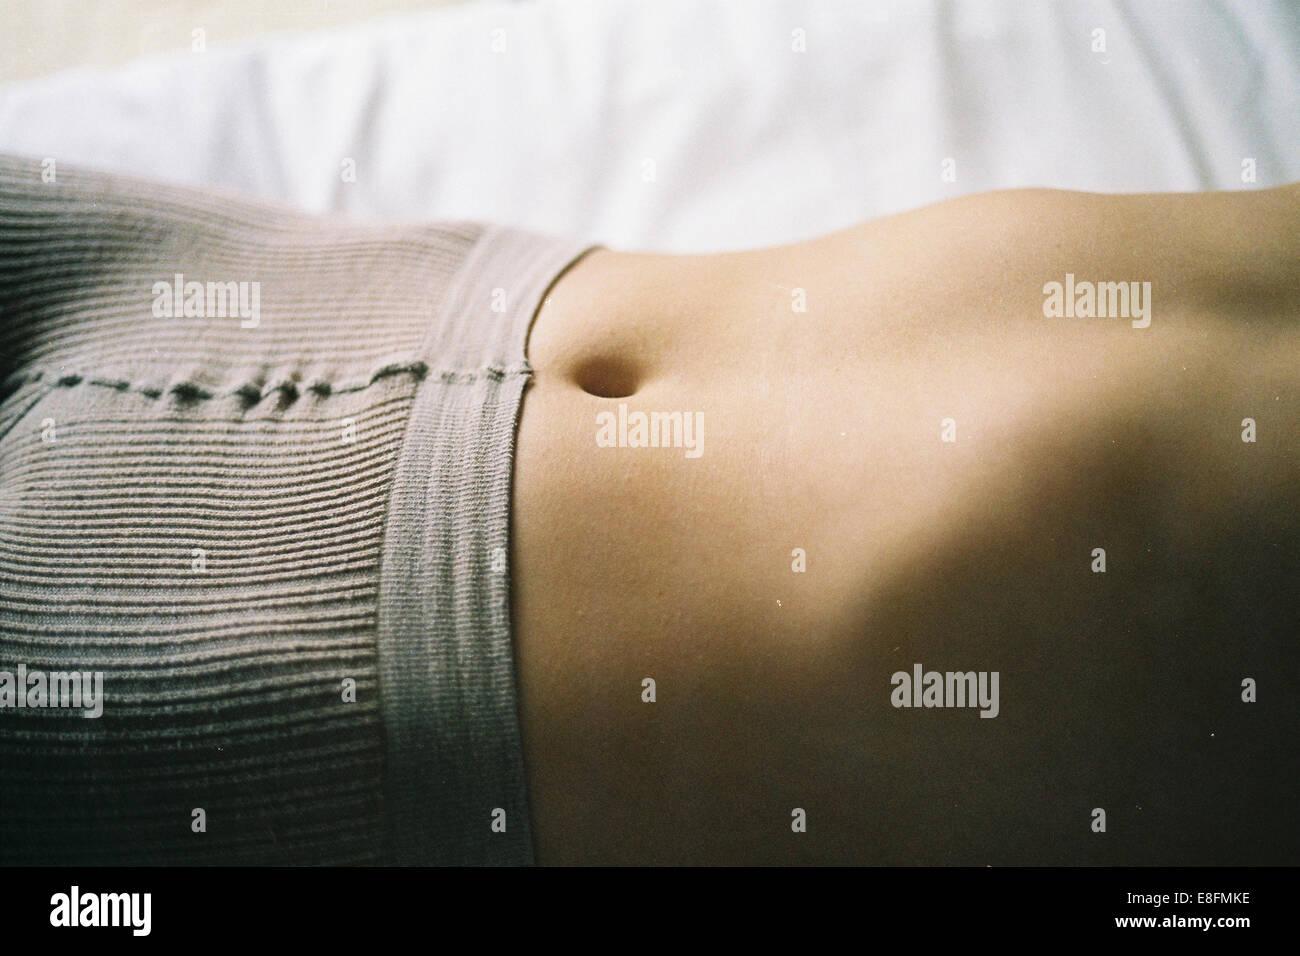 Female abdomen - Stock Image